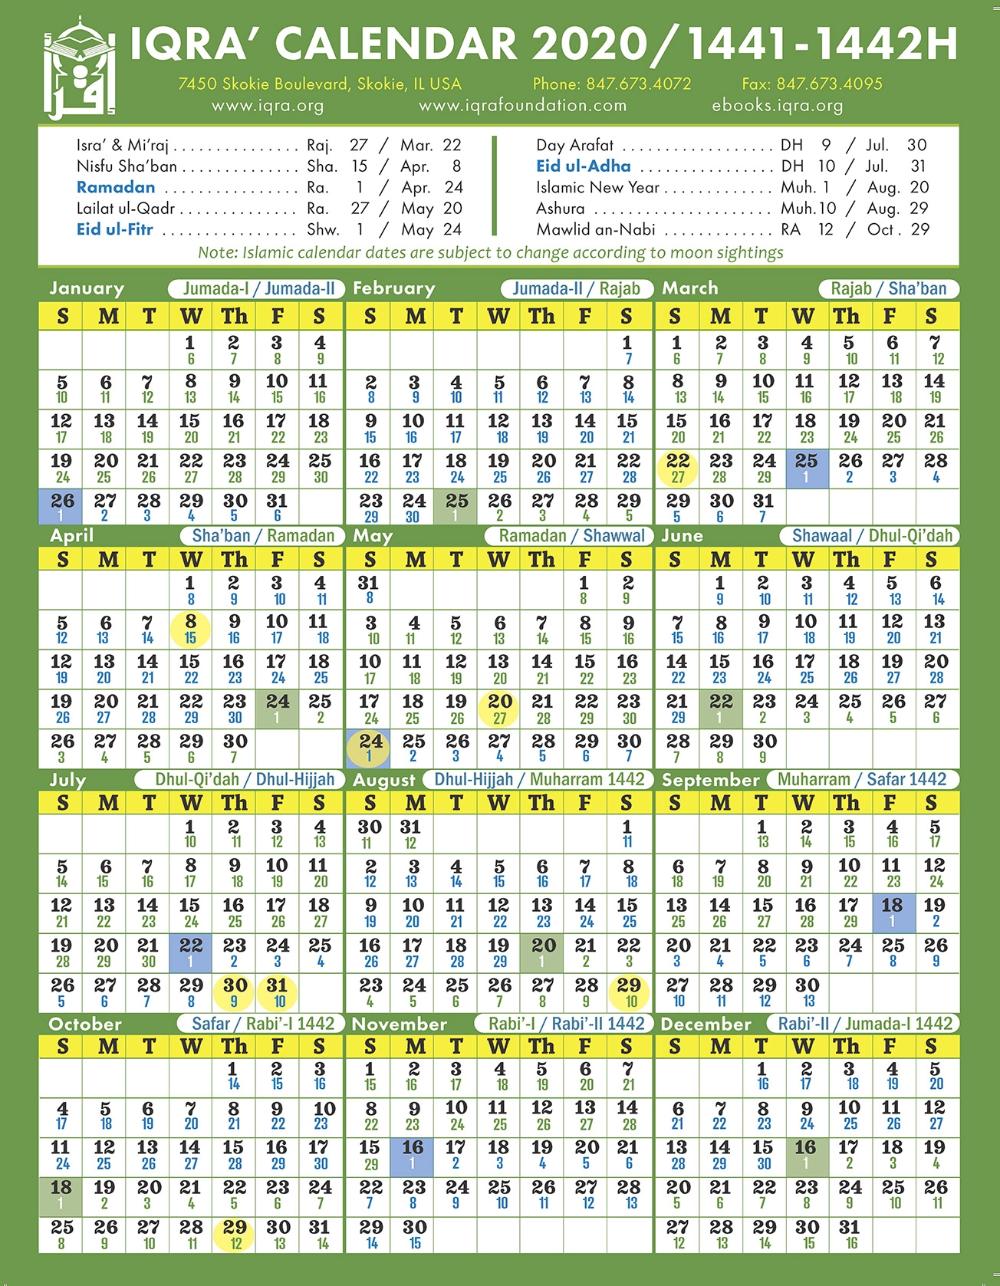 Iqra Calendar 2020 1441 1442h Islamic Dates Islamic Calendar Islamic New Year Hijri Calendar